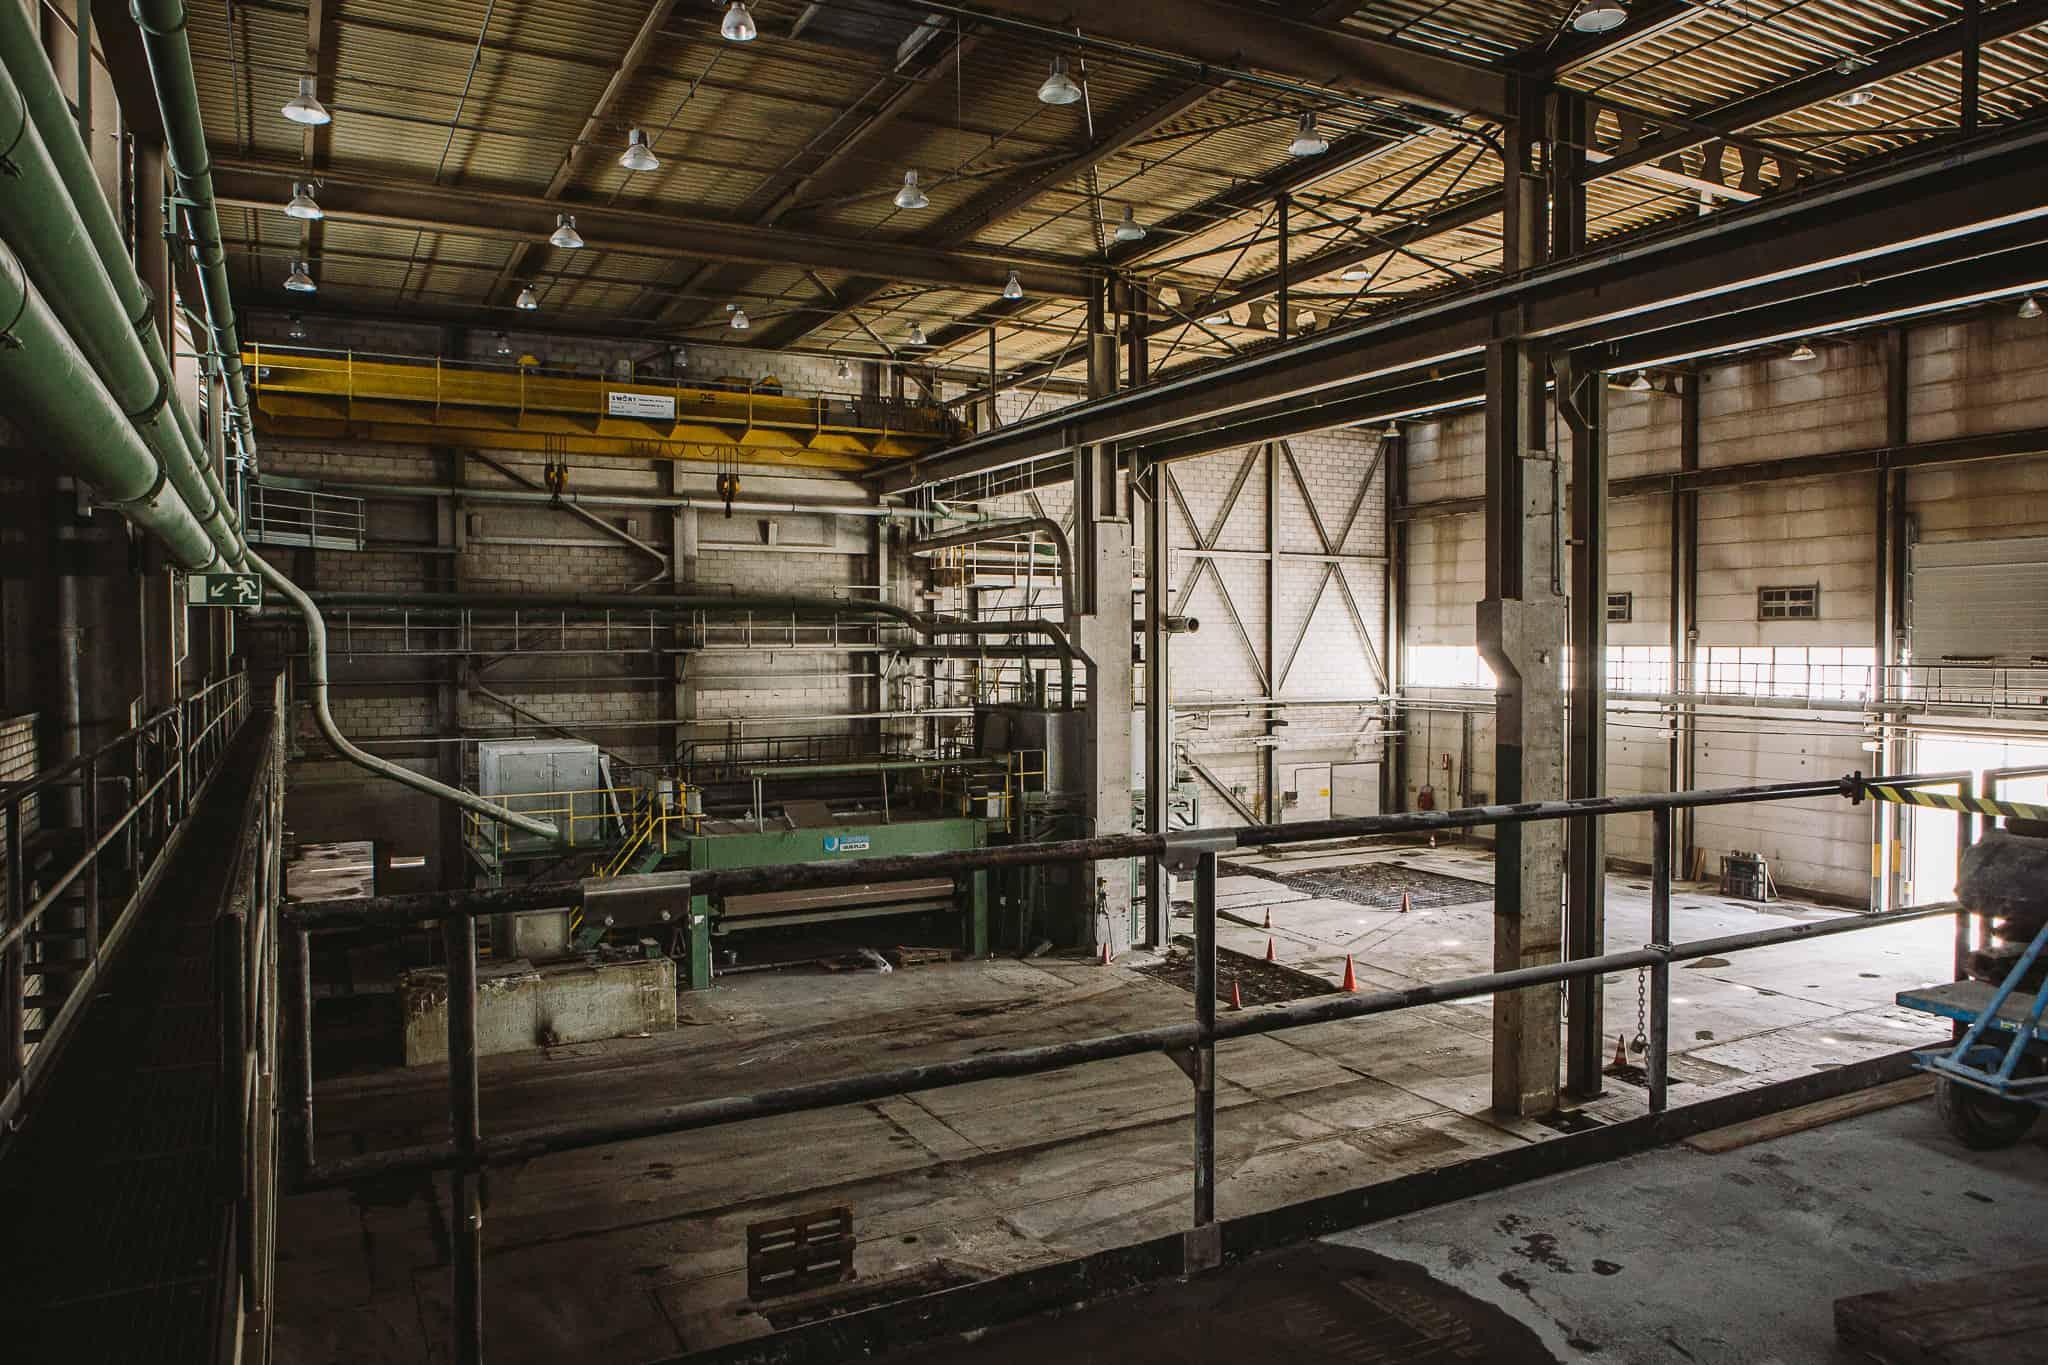 EKI_Nijmegen_30 - papierfabriek - industreel - locatie